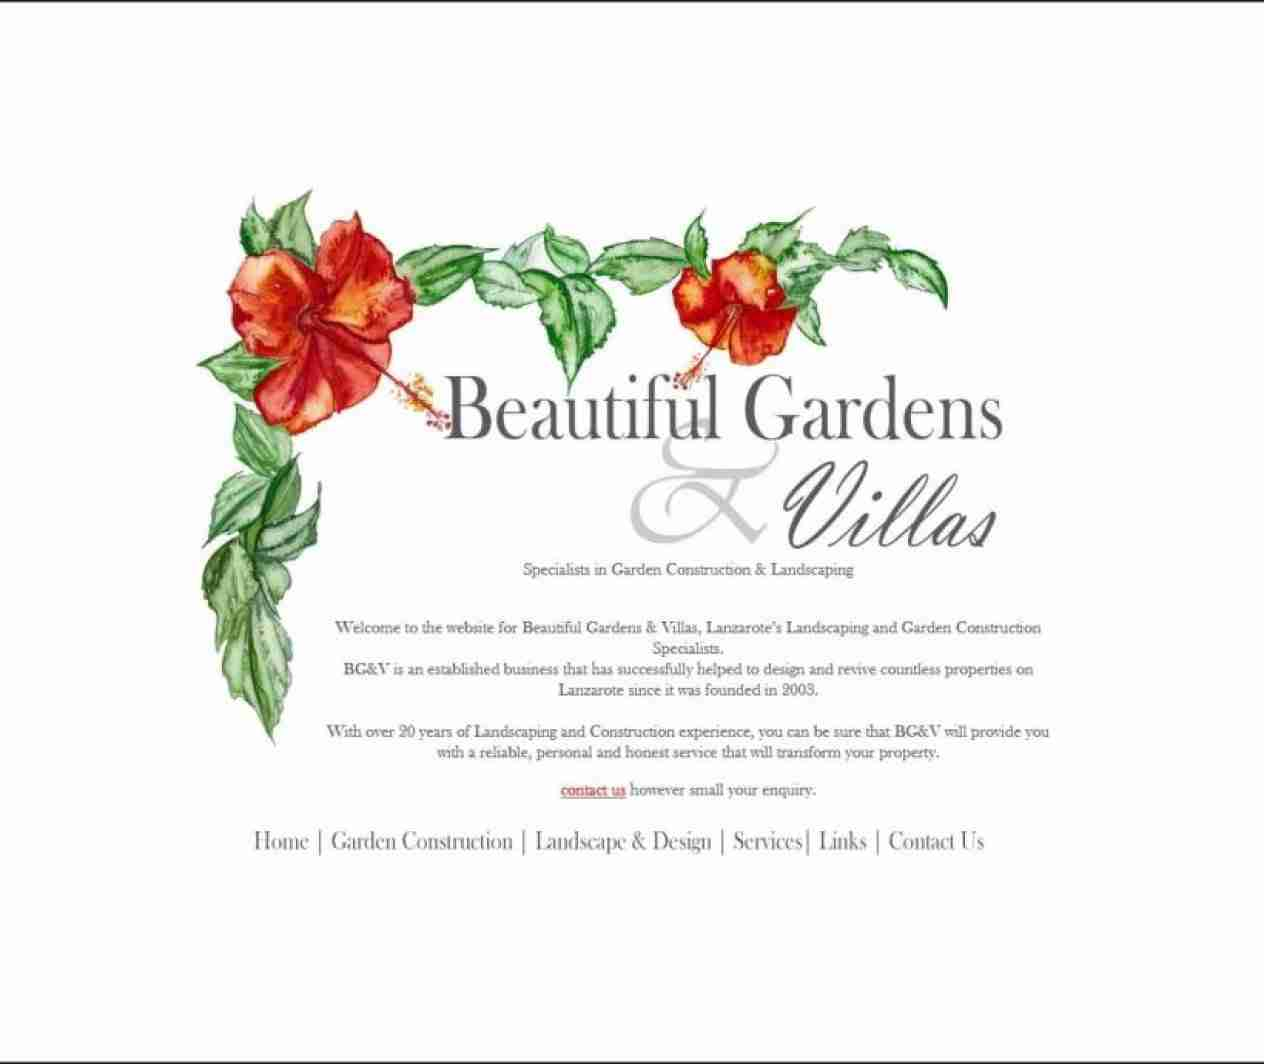 Beautiful Gardens and Villas